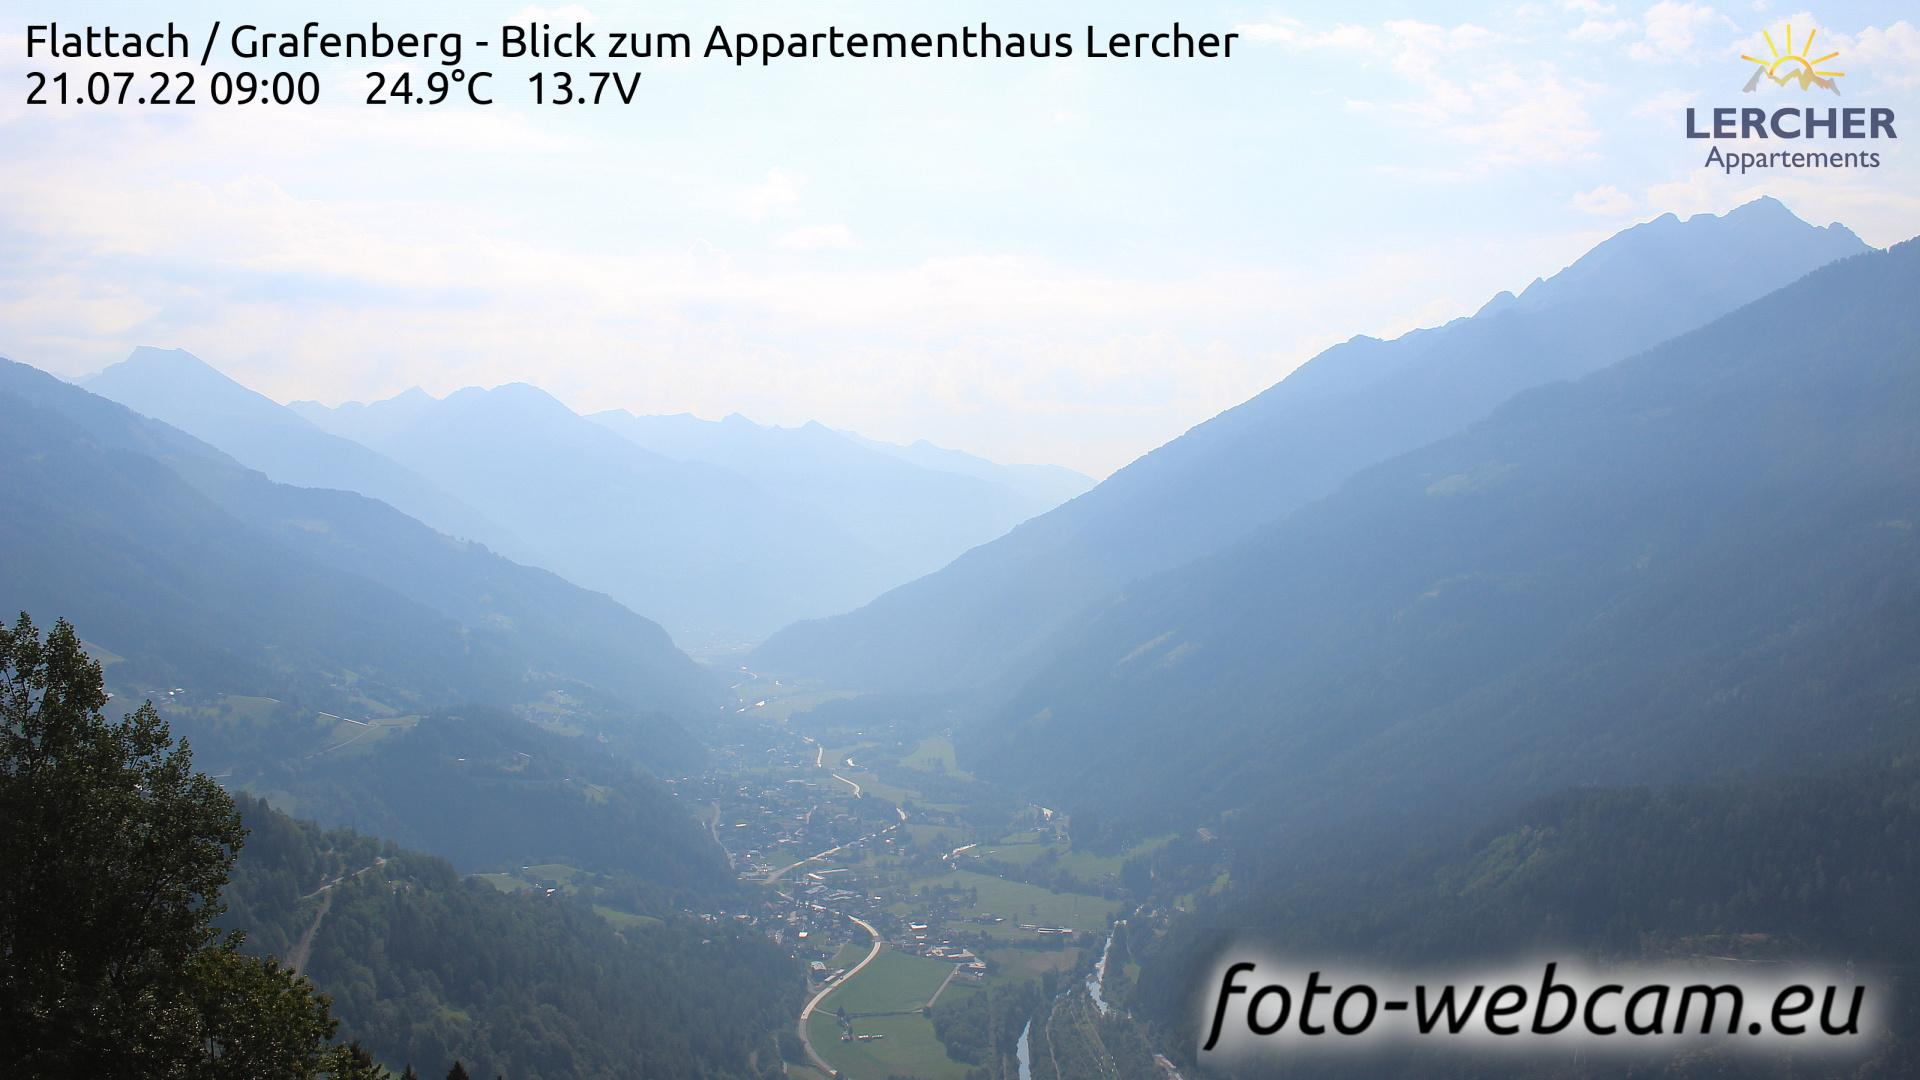 Webcam Flattach: Grafenberg − Blick zum Appartementhaus L